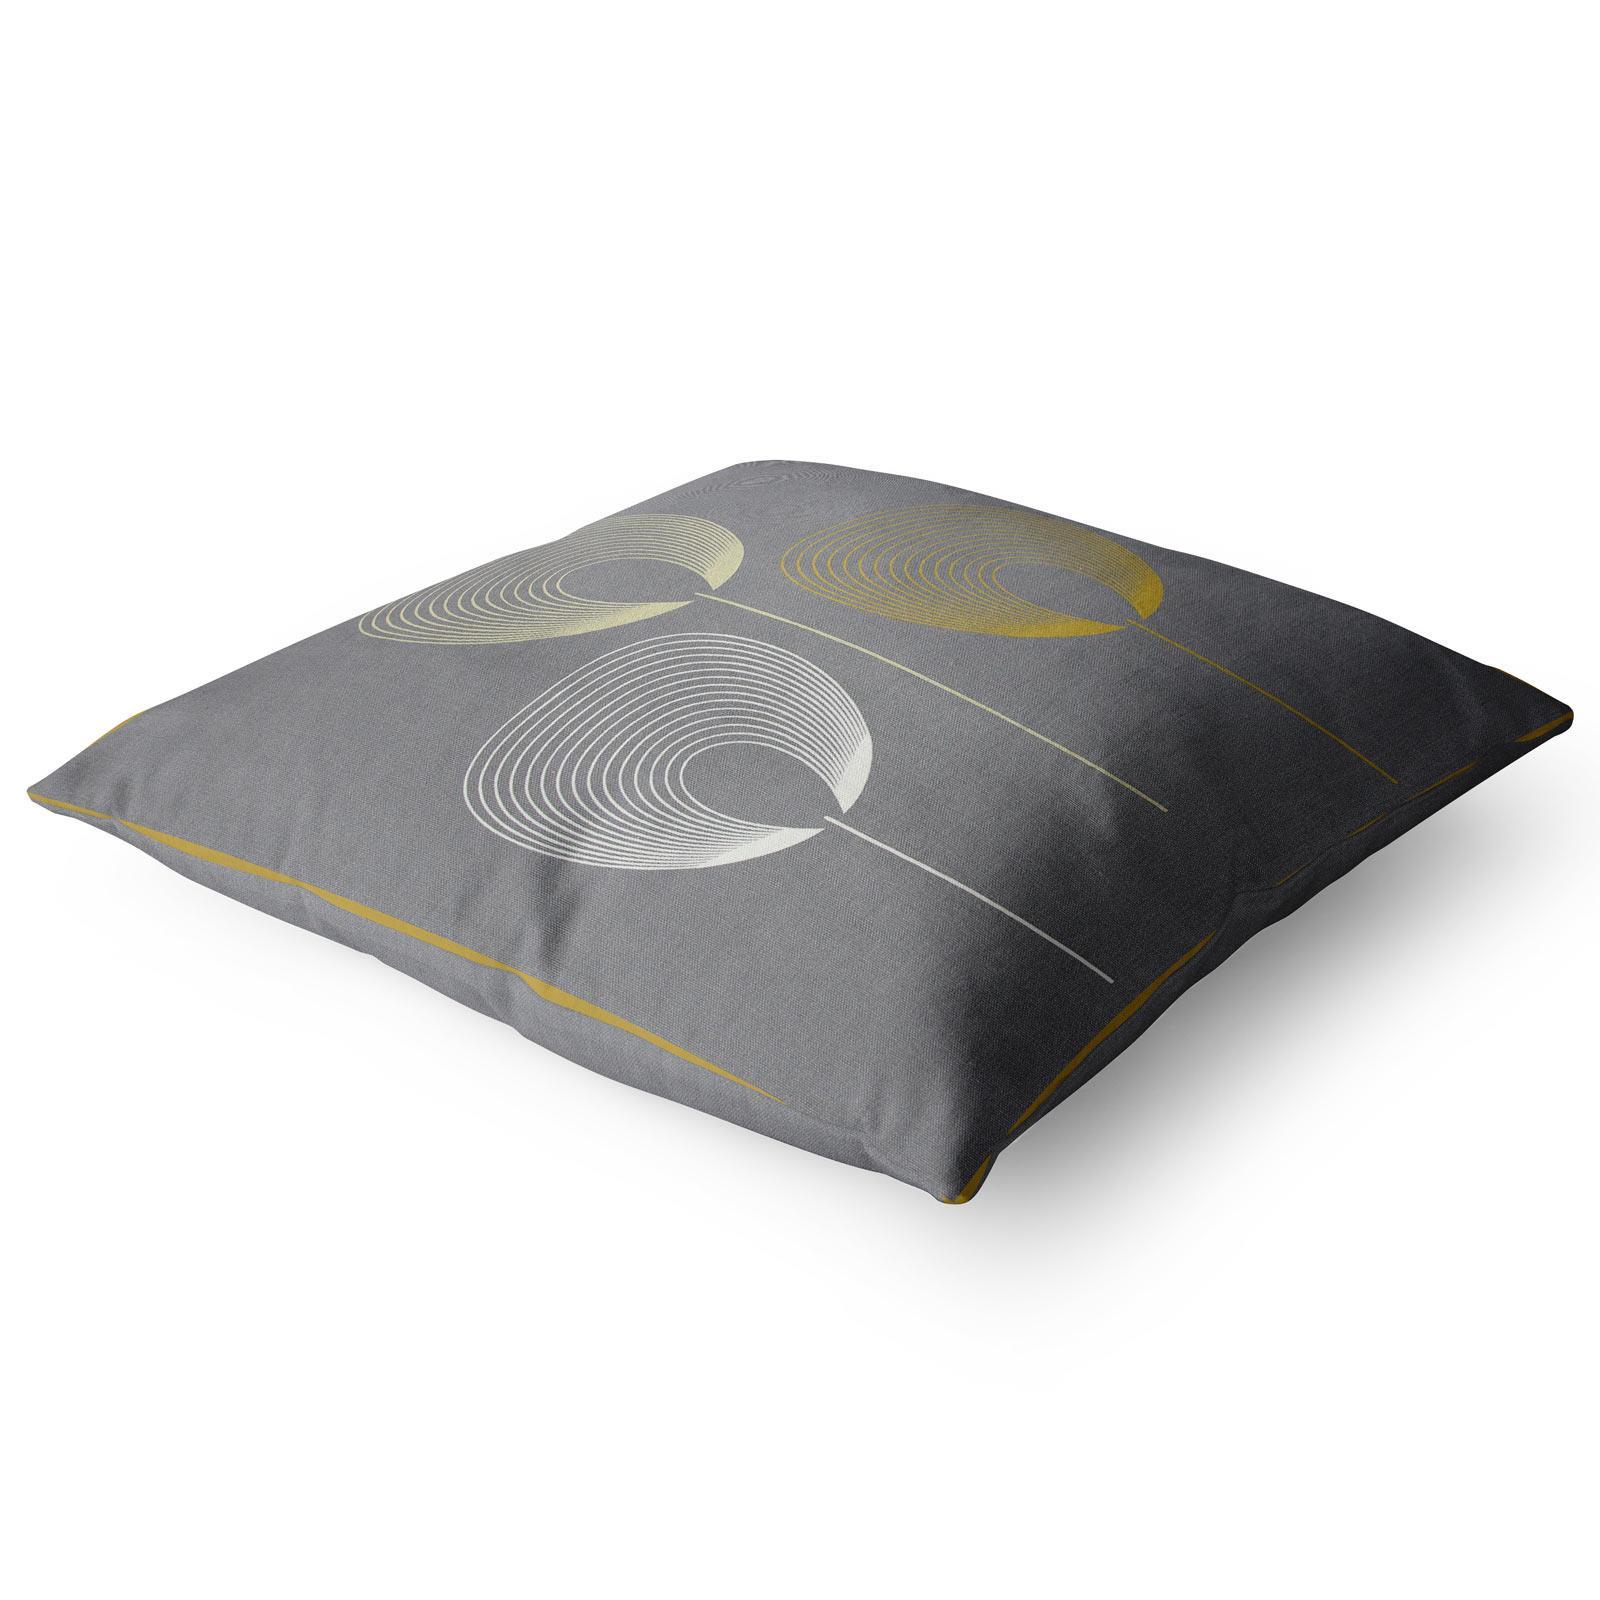 Geometrica-Cushion-Covers-Cojines-De-Impresion-Floral-Gris-Beige-Ocre-cubre-17-034-X-17-034 miniatura 15